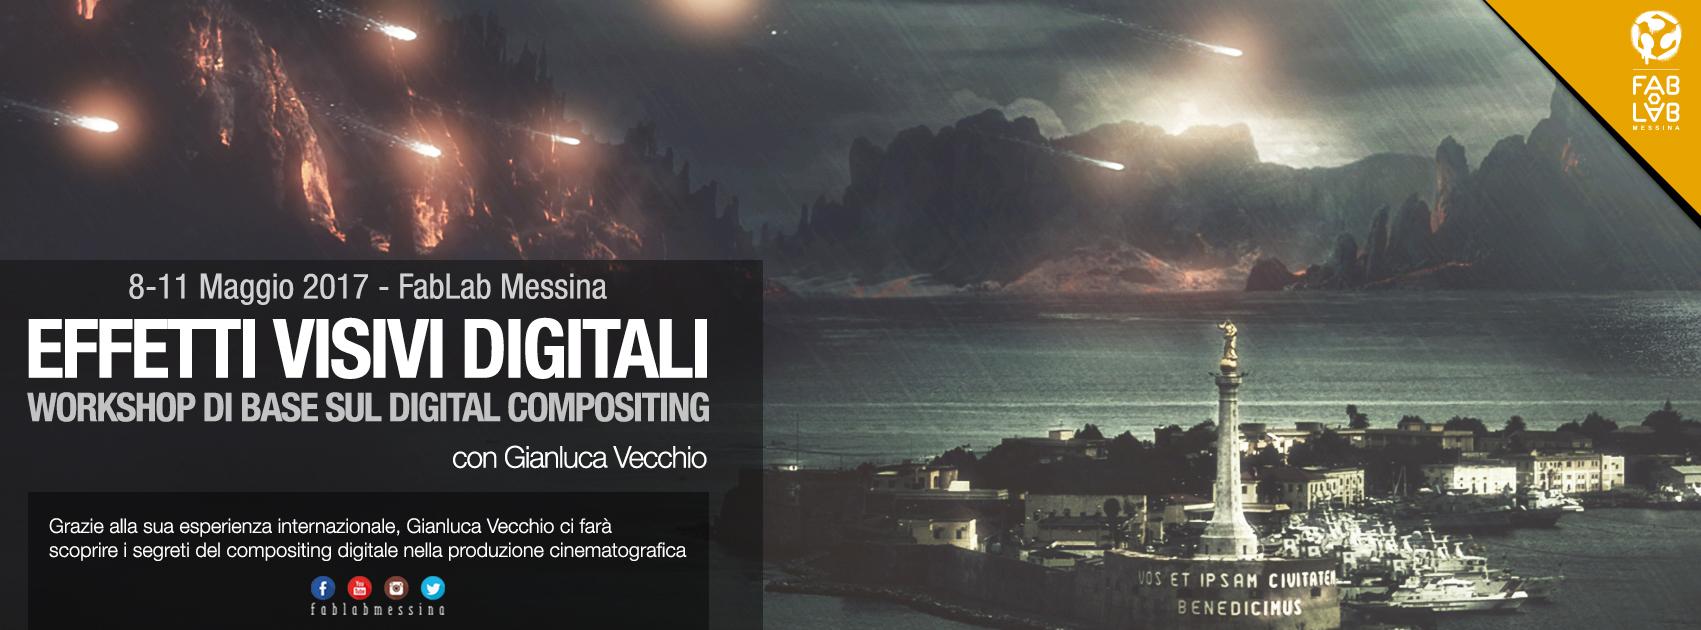 Effetti Visivi Digitali – Workshop di base sul Digital Compositing